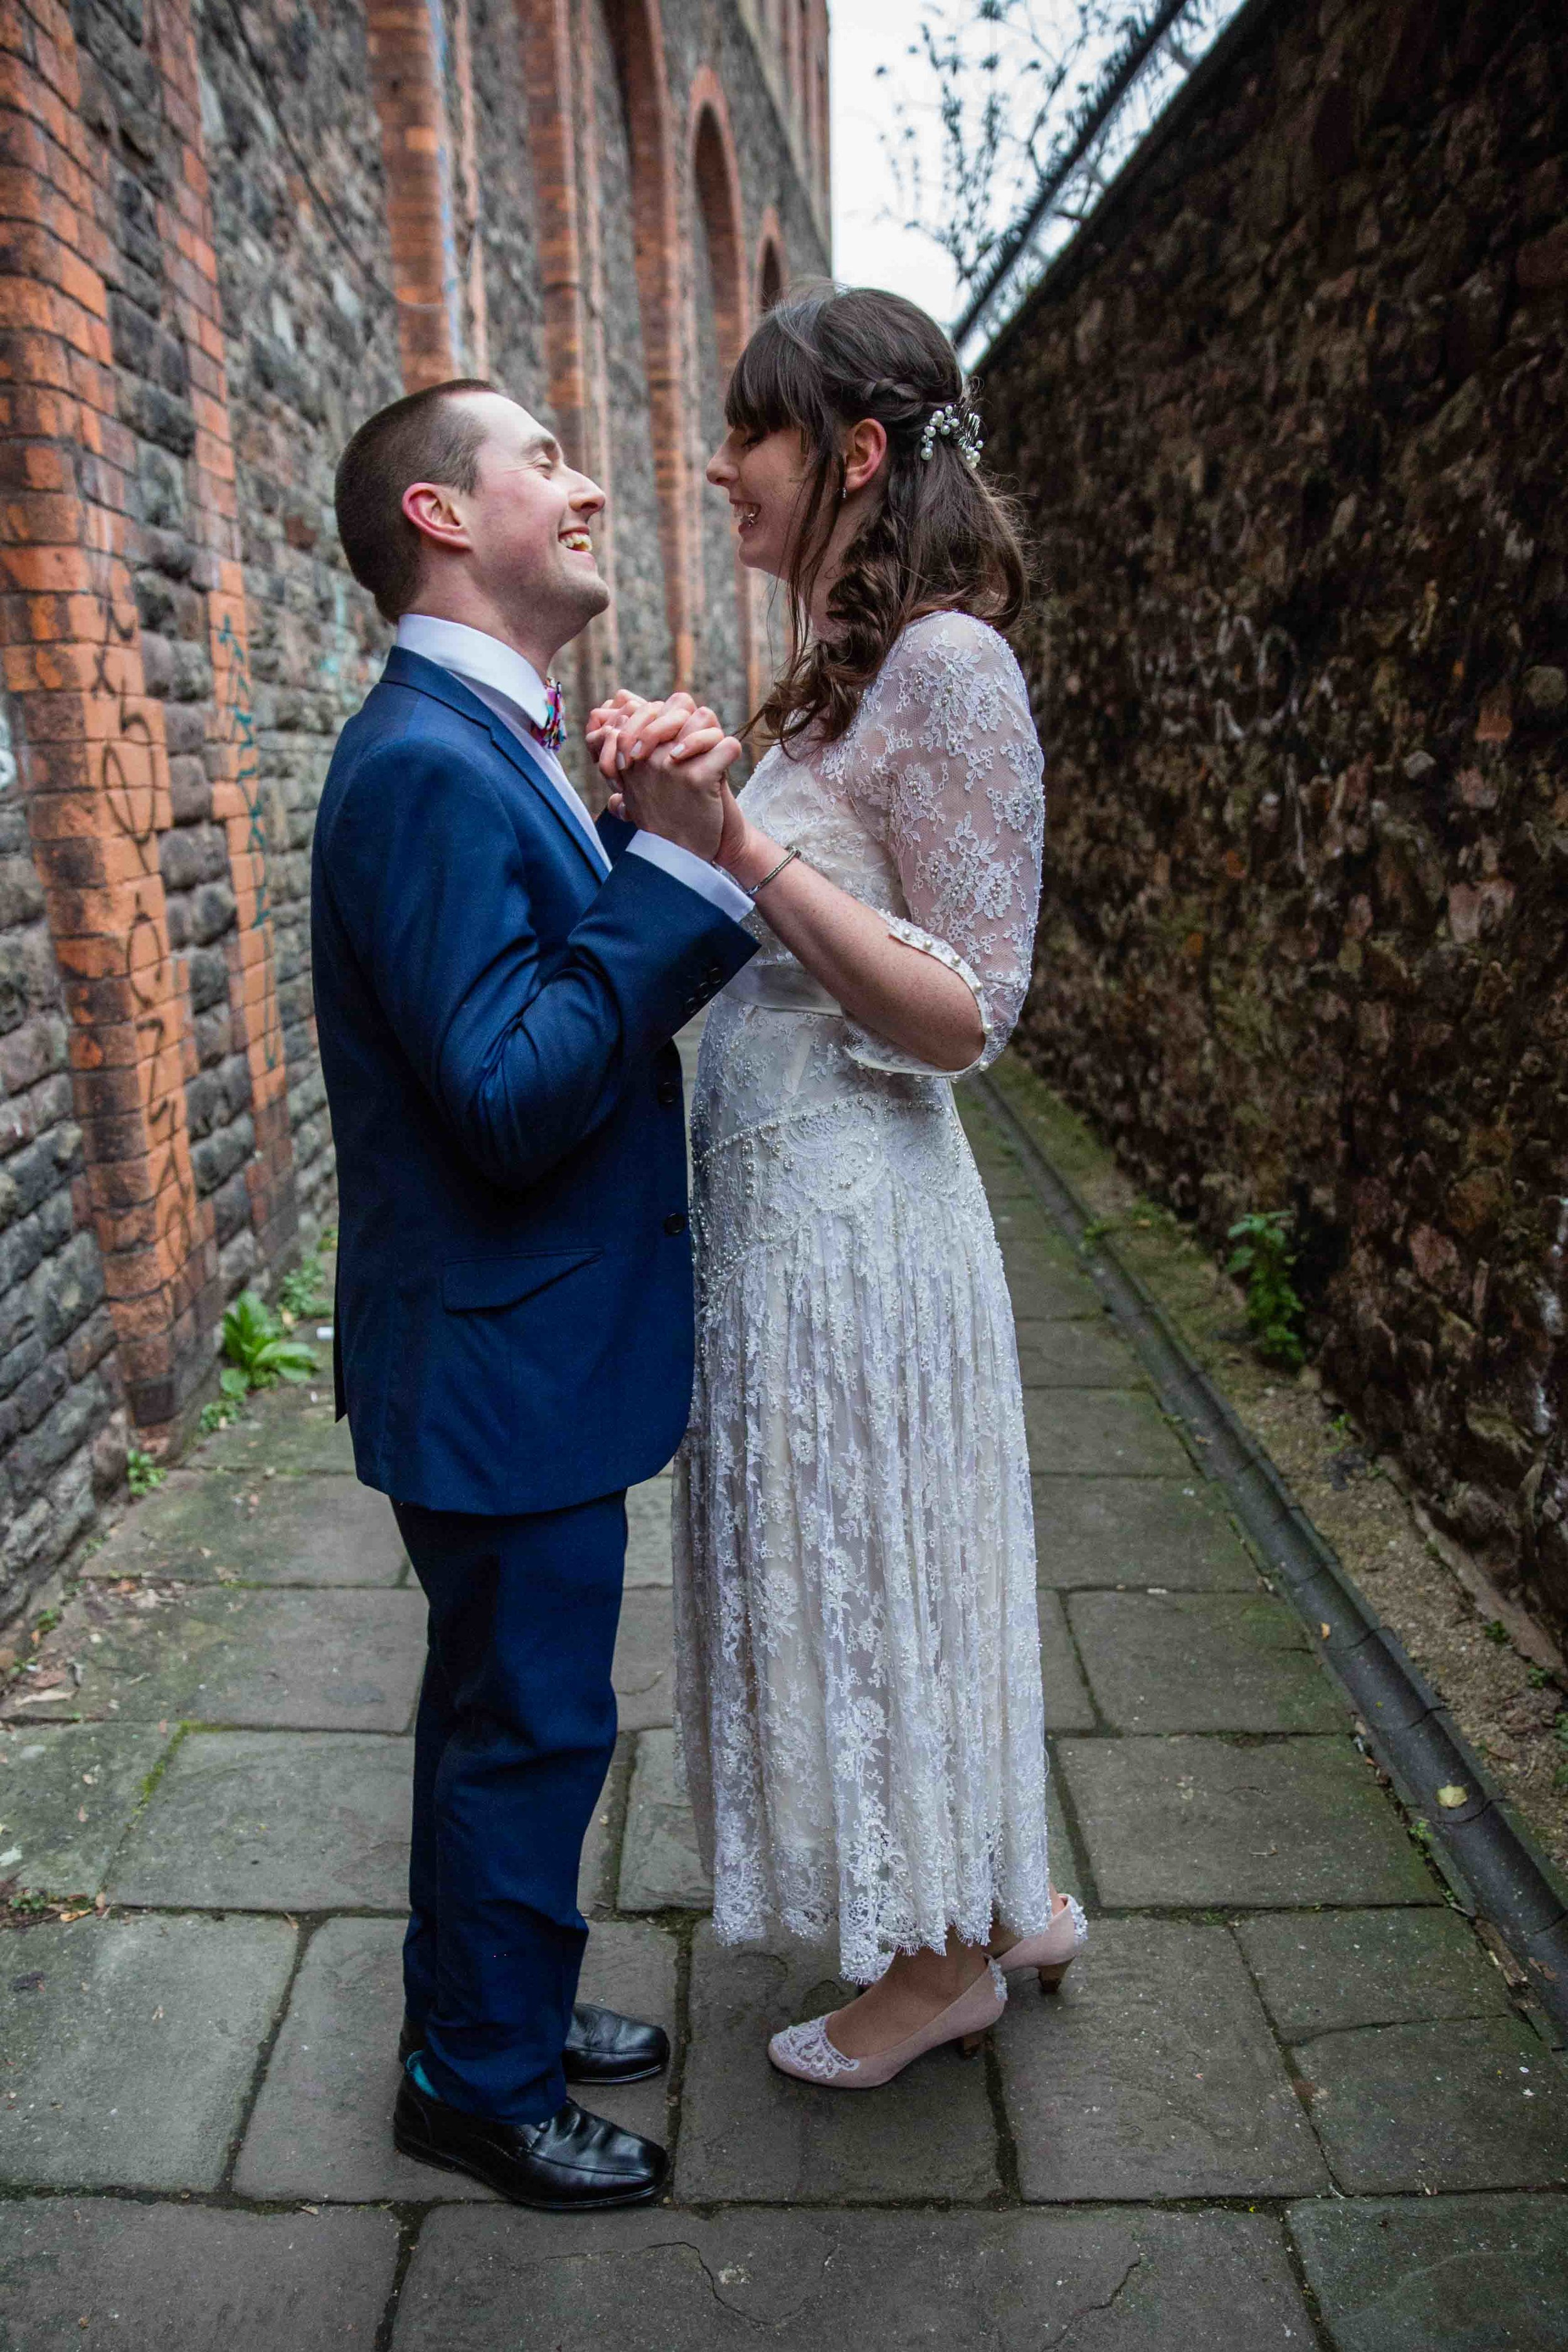 Adam & Faye - Wright Wedding Photography - Bristol Wedding Photographer -307.jpg